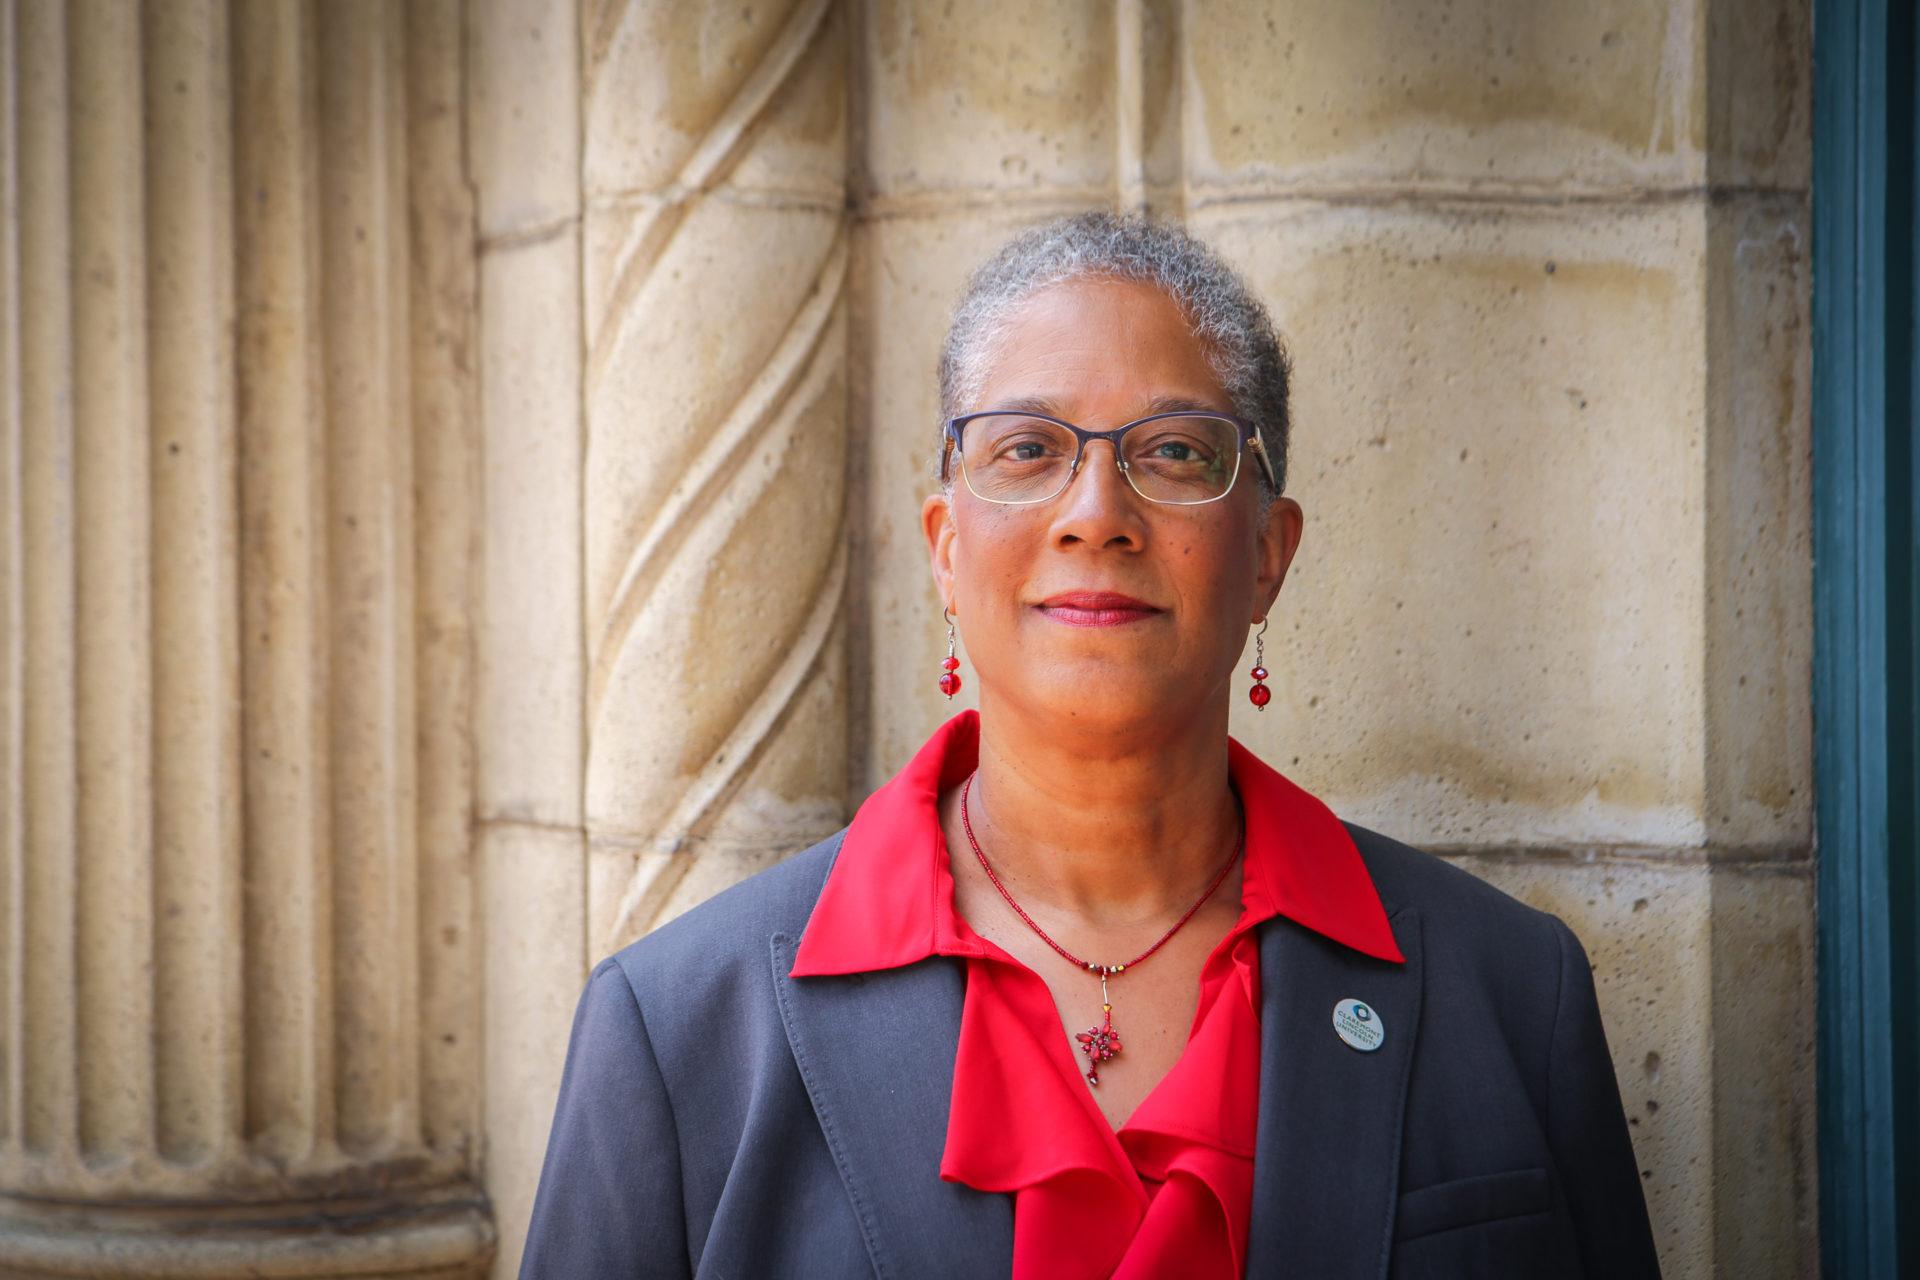 Audrey D. Jordan Ph.D